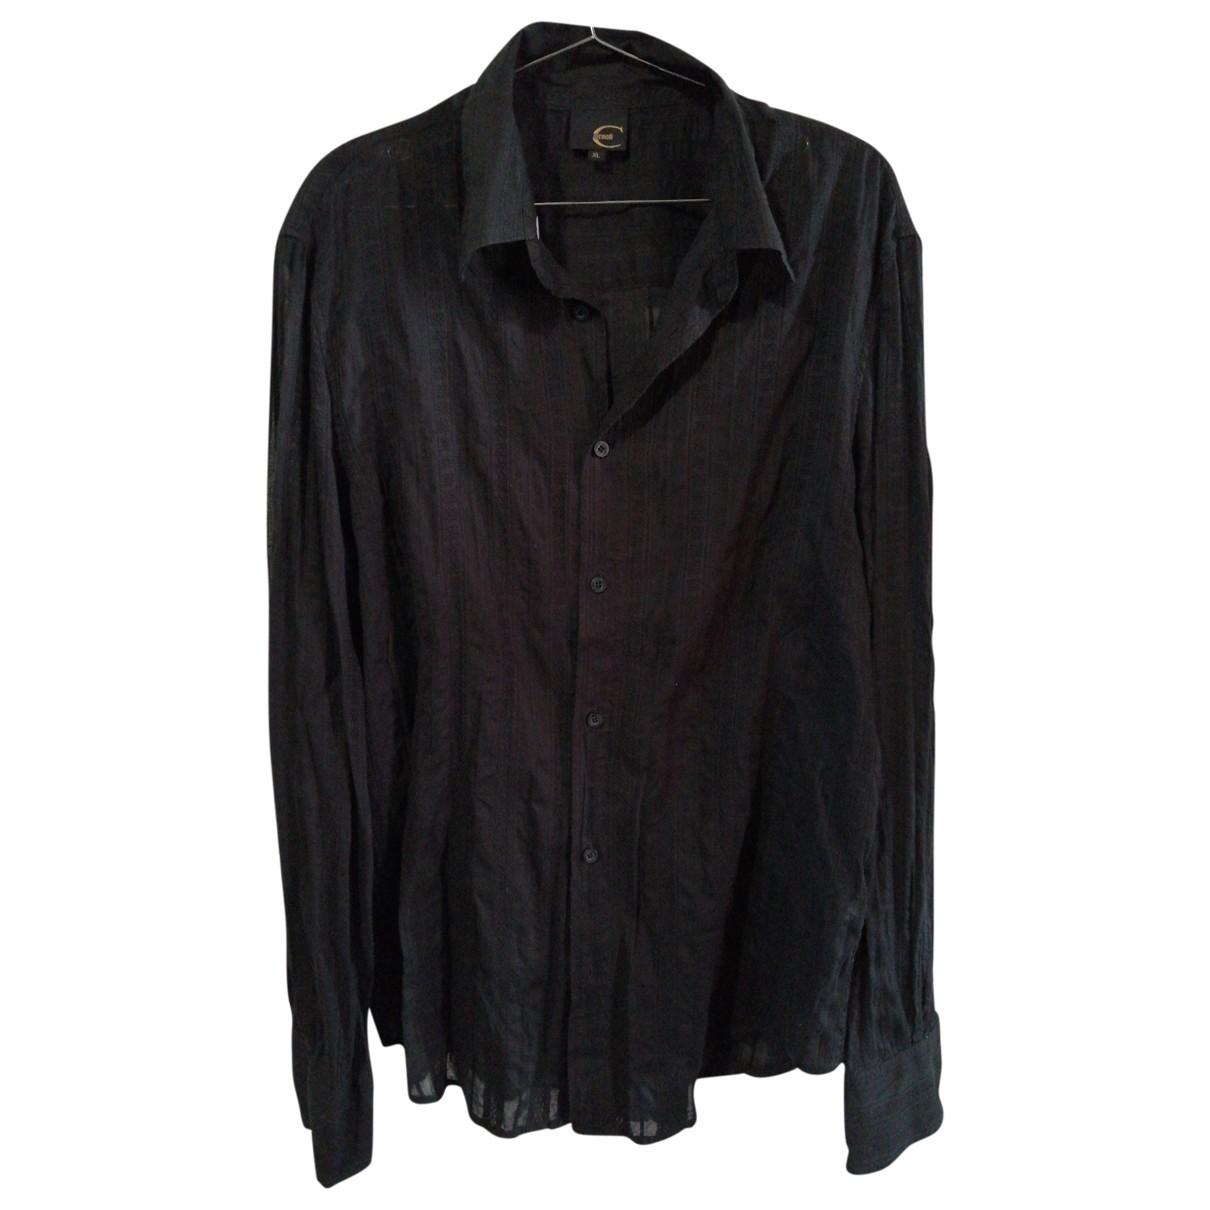 Just Cavalli \N Black Shirts for Men XL International